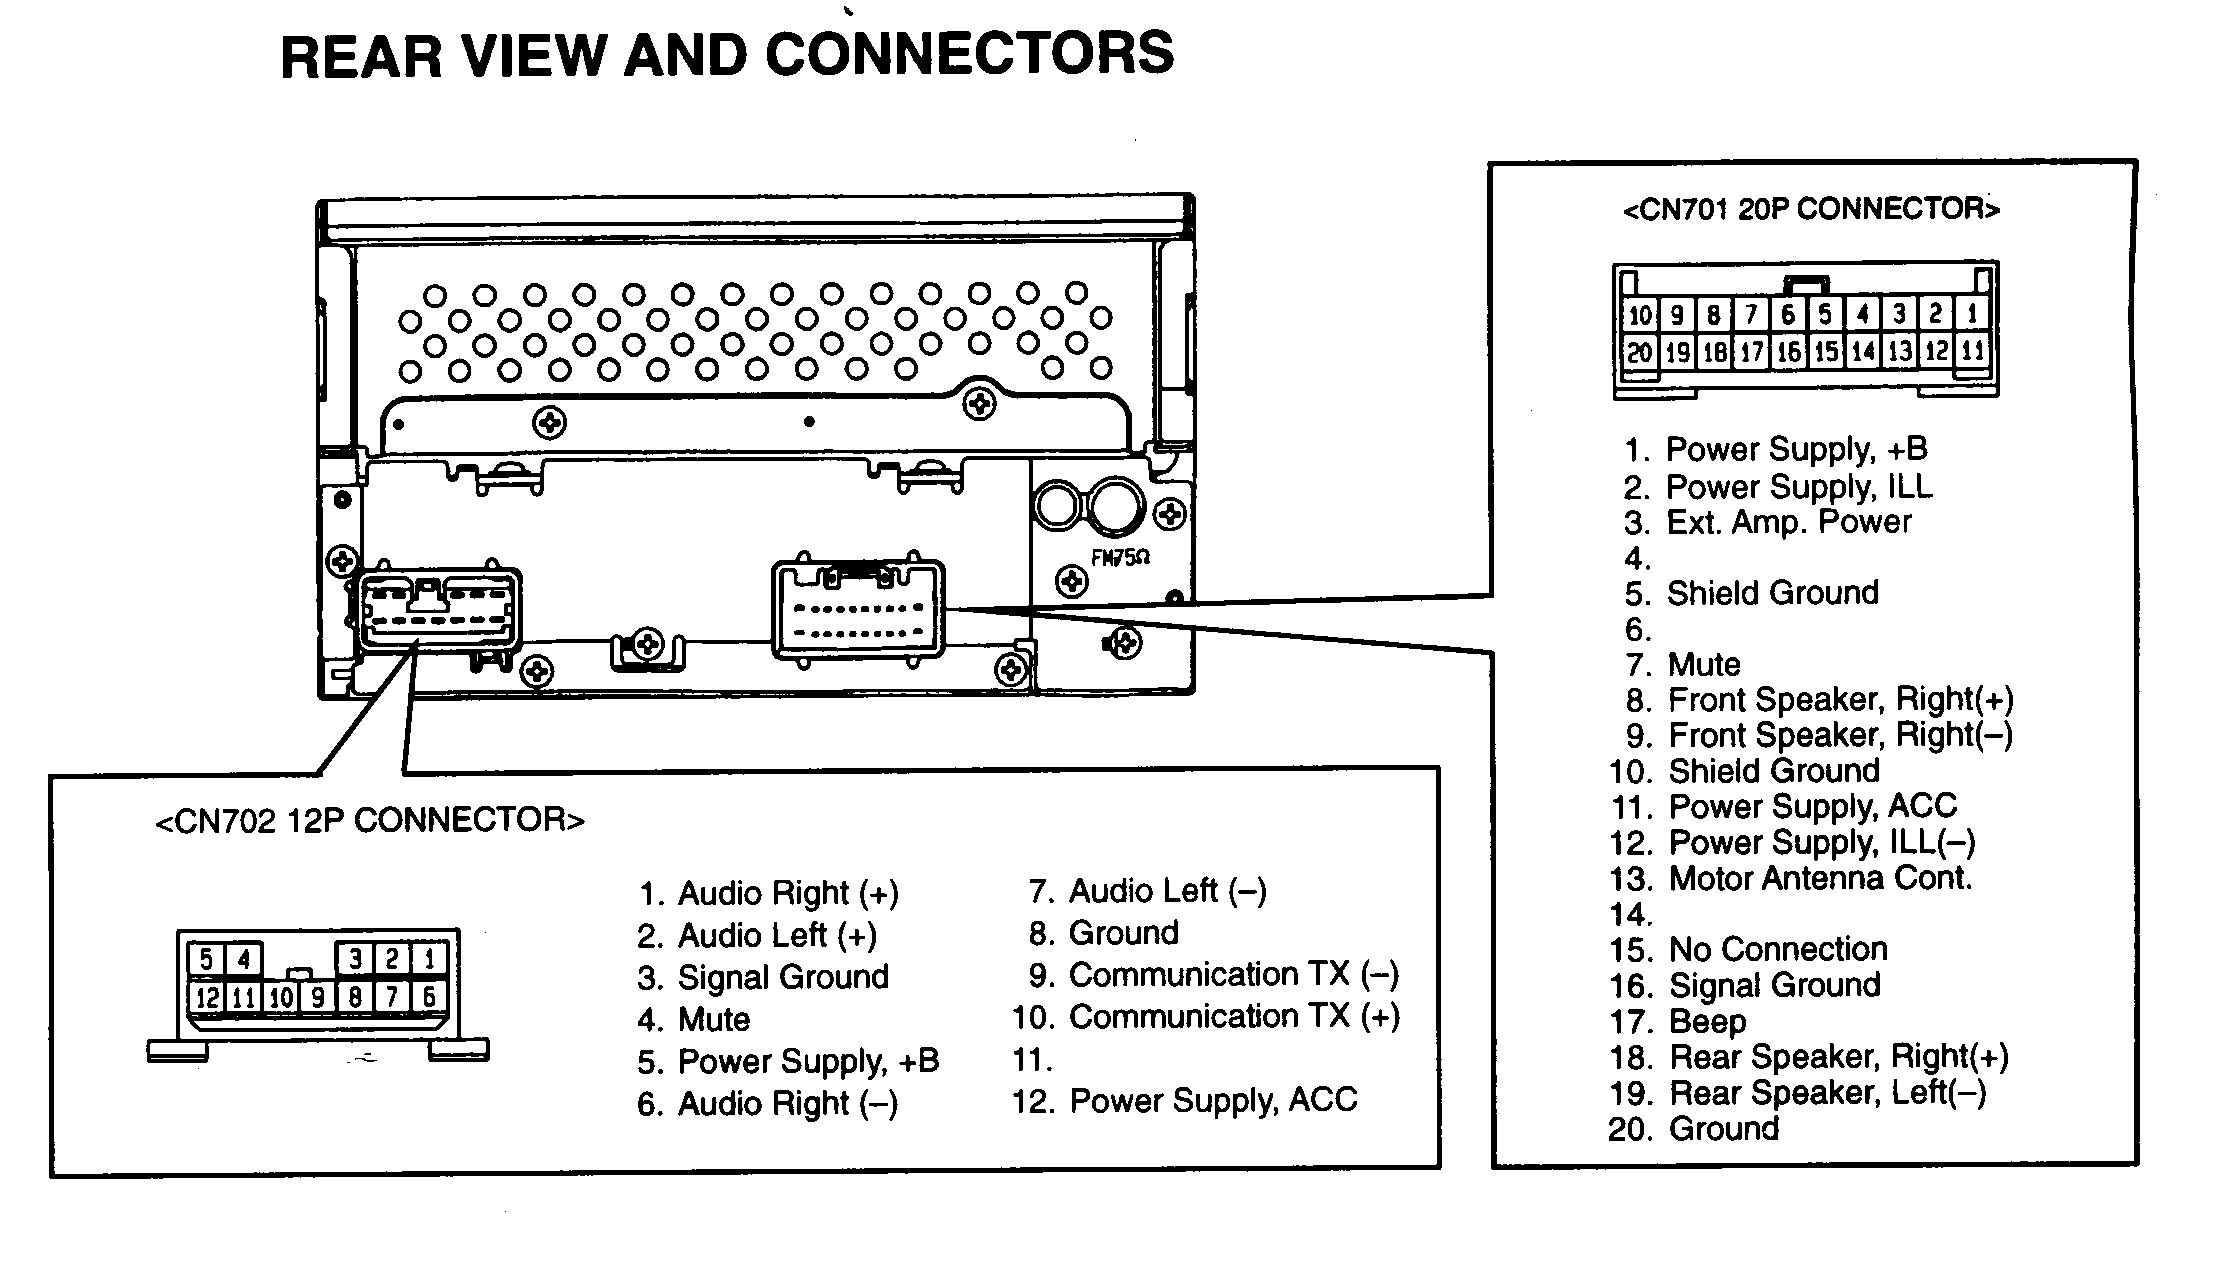 Jvc Car Audio Wiring Diagram with Factory Car Stereo Wiring Diagrams Wiring Diagram Of Jvc Car Audio Wiring Diagram